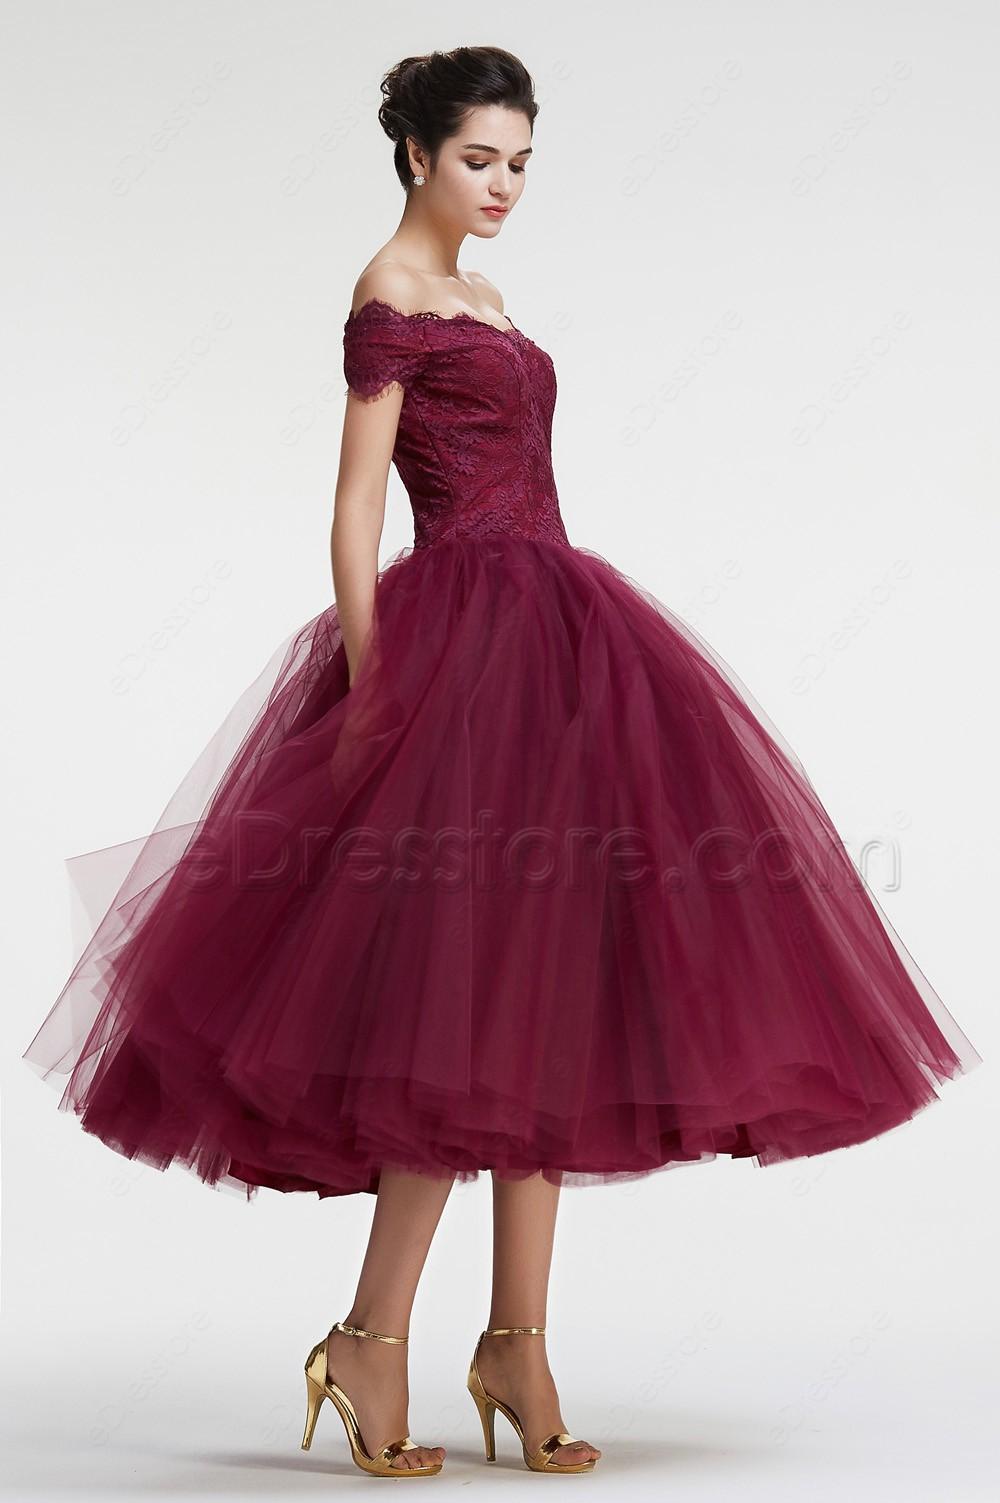 Burgundy Off the Shoulder Ball Gown VIntage Prom Dresses